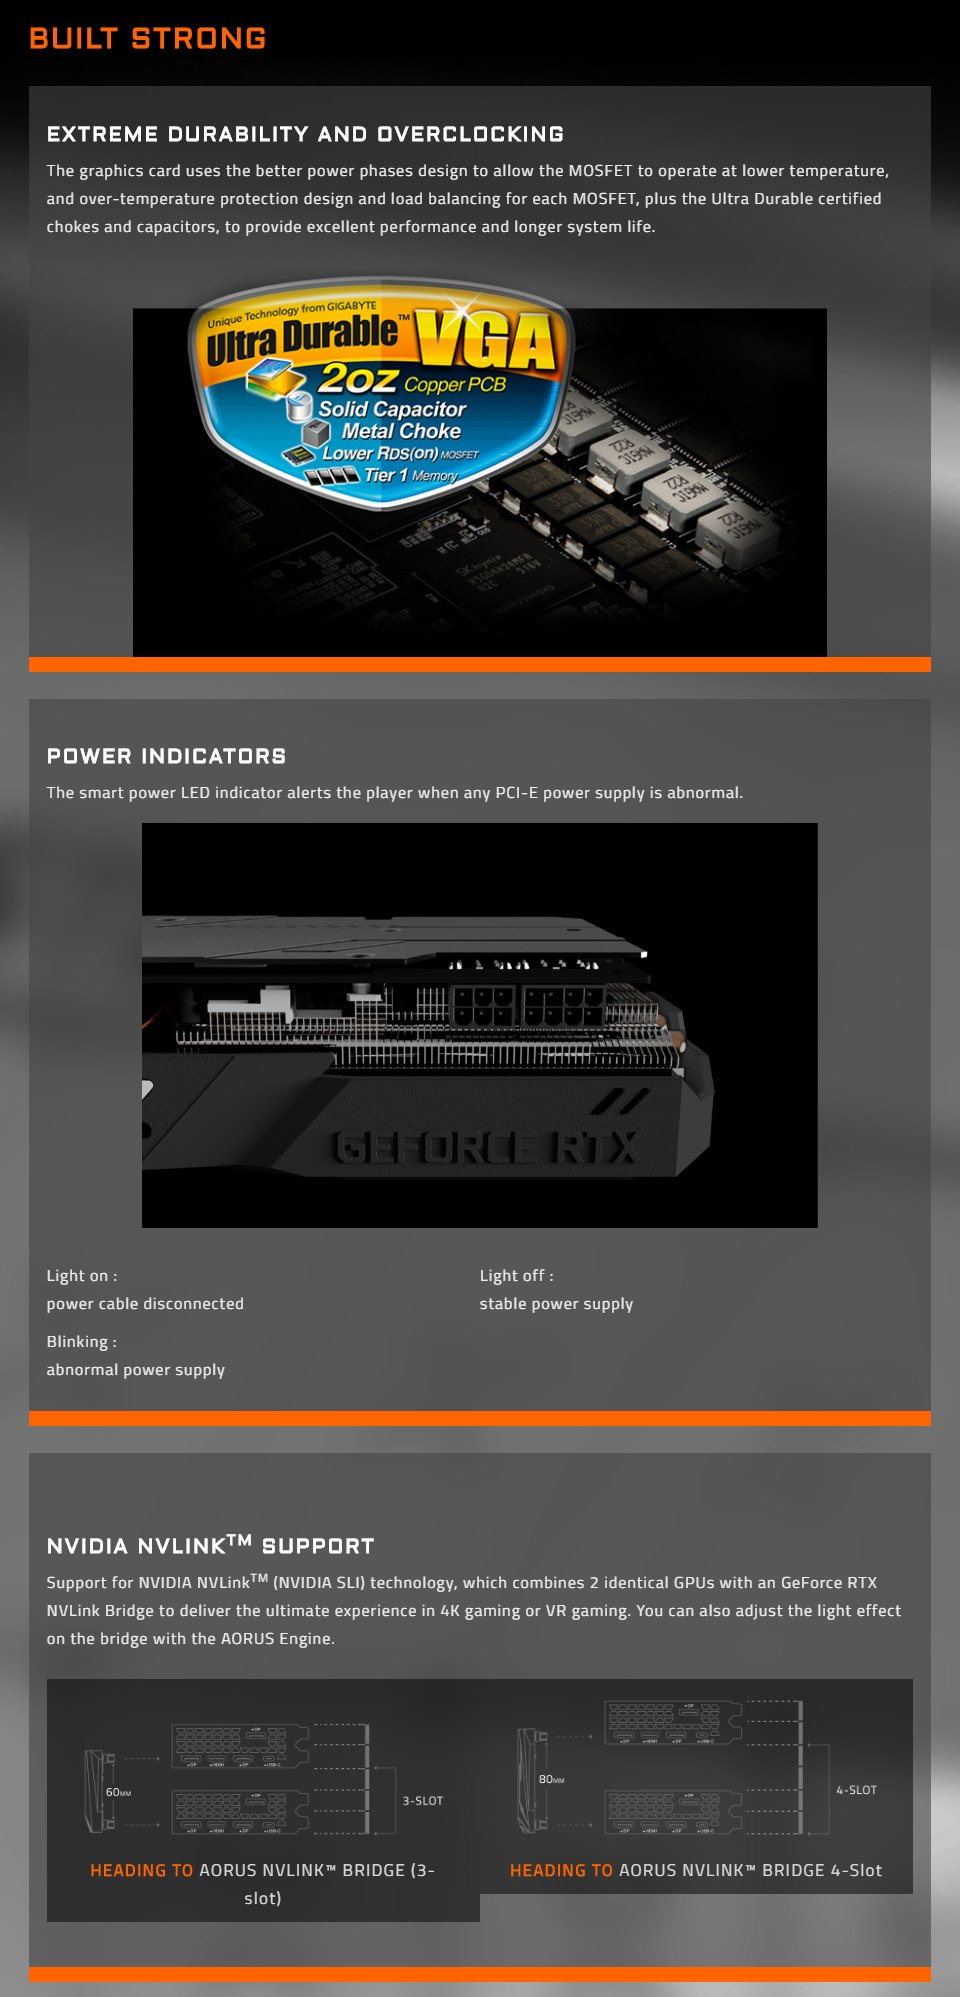 Gigabyte GeForce RTX 2070 Super Gaming OC 3X 8GB features 6